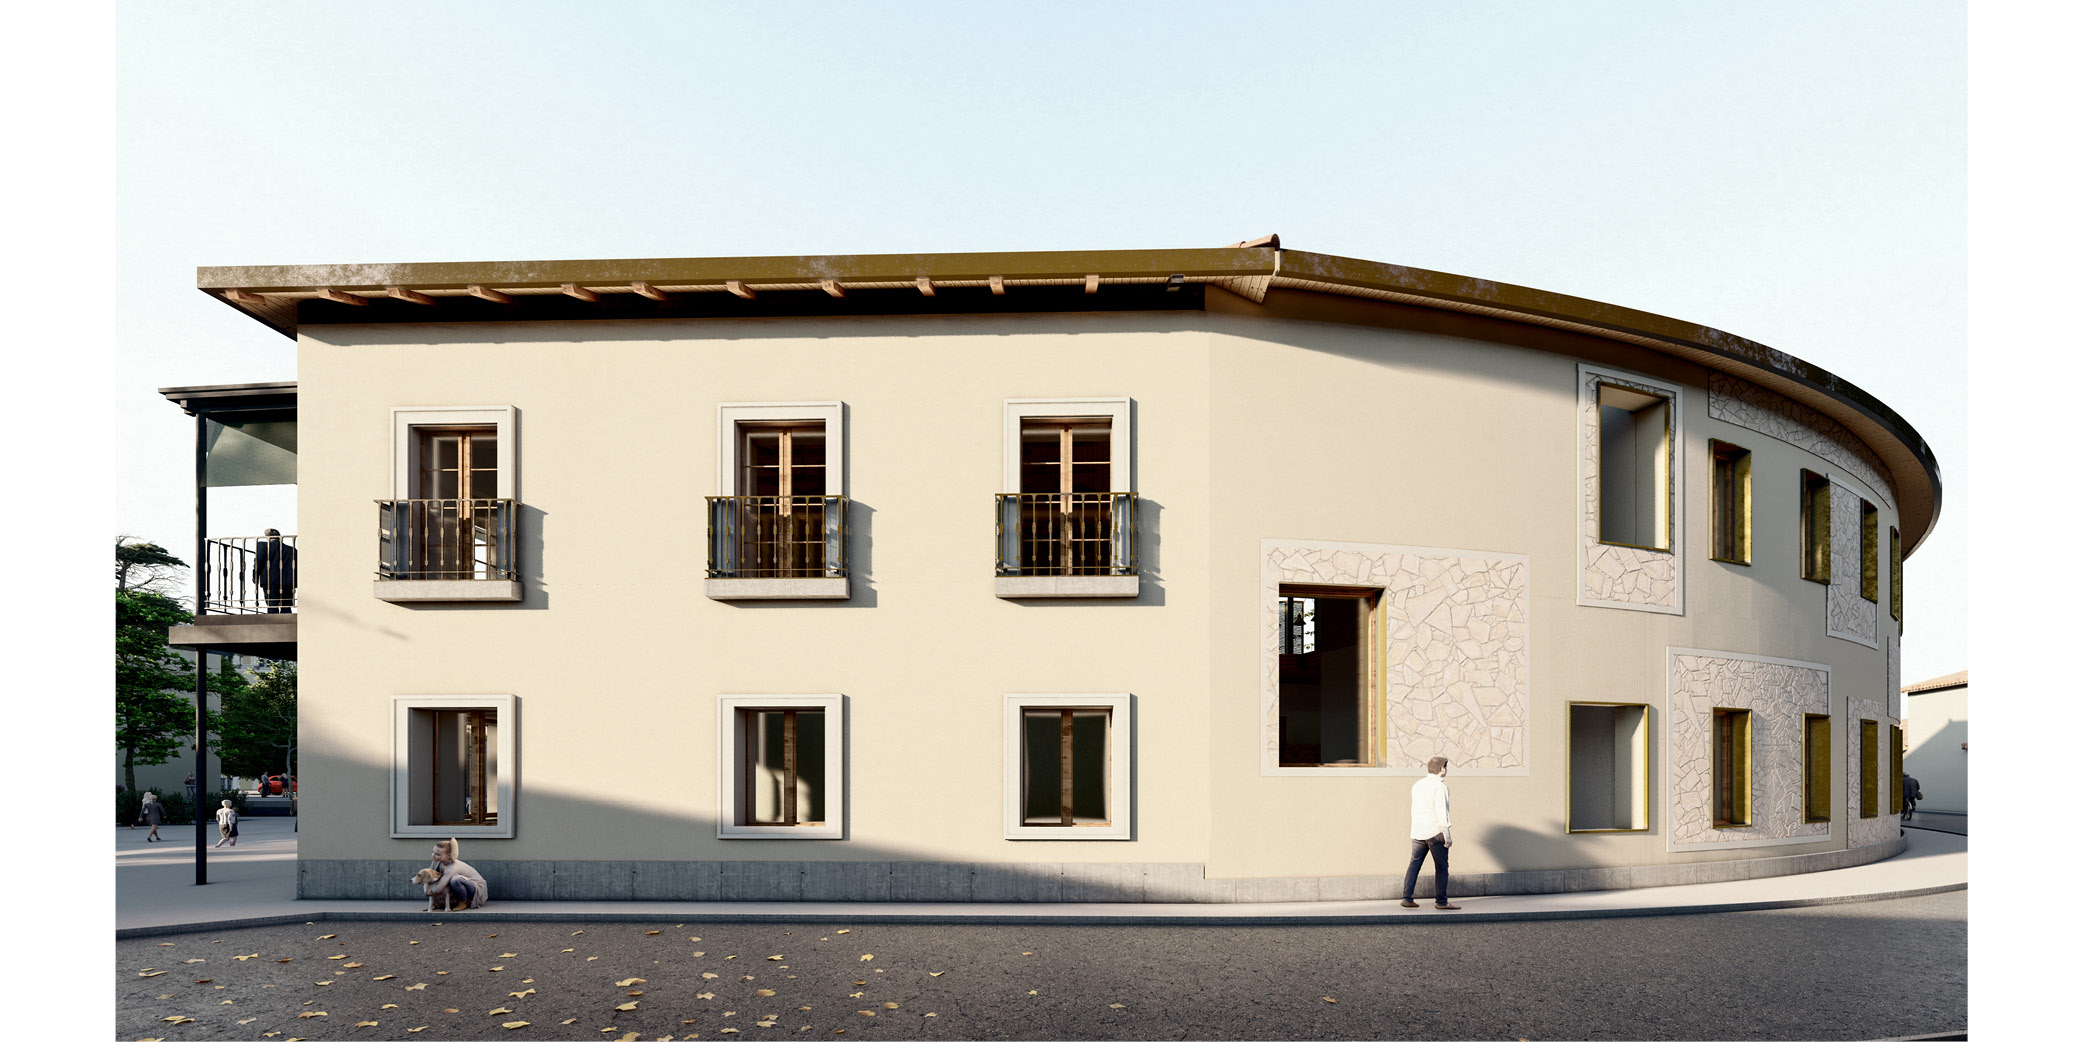 Daganzo City Hall Extention Architecture Arquitectura OCA ARCHITECTS OCA arquitectas Hernan Lleida Bernardo Garcia_5